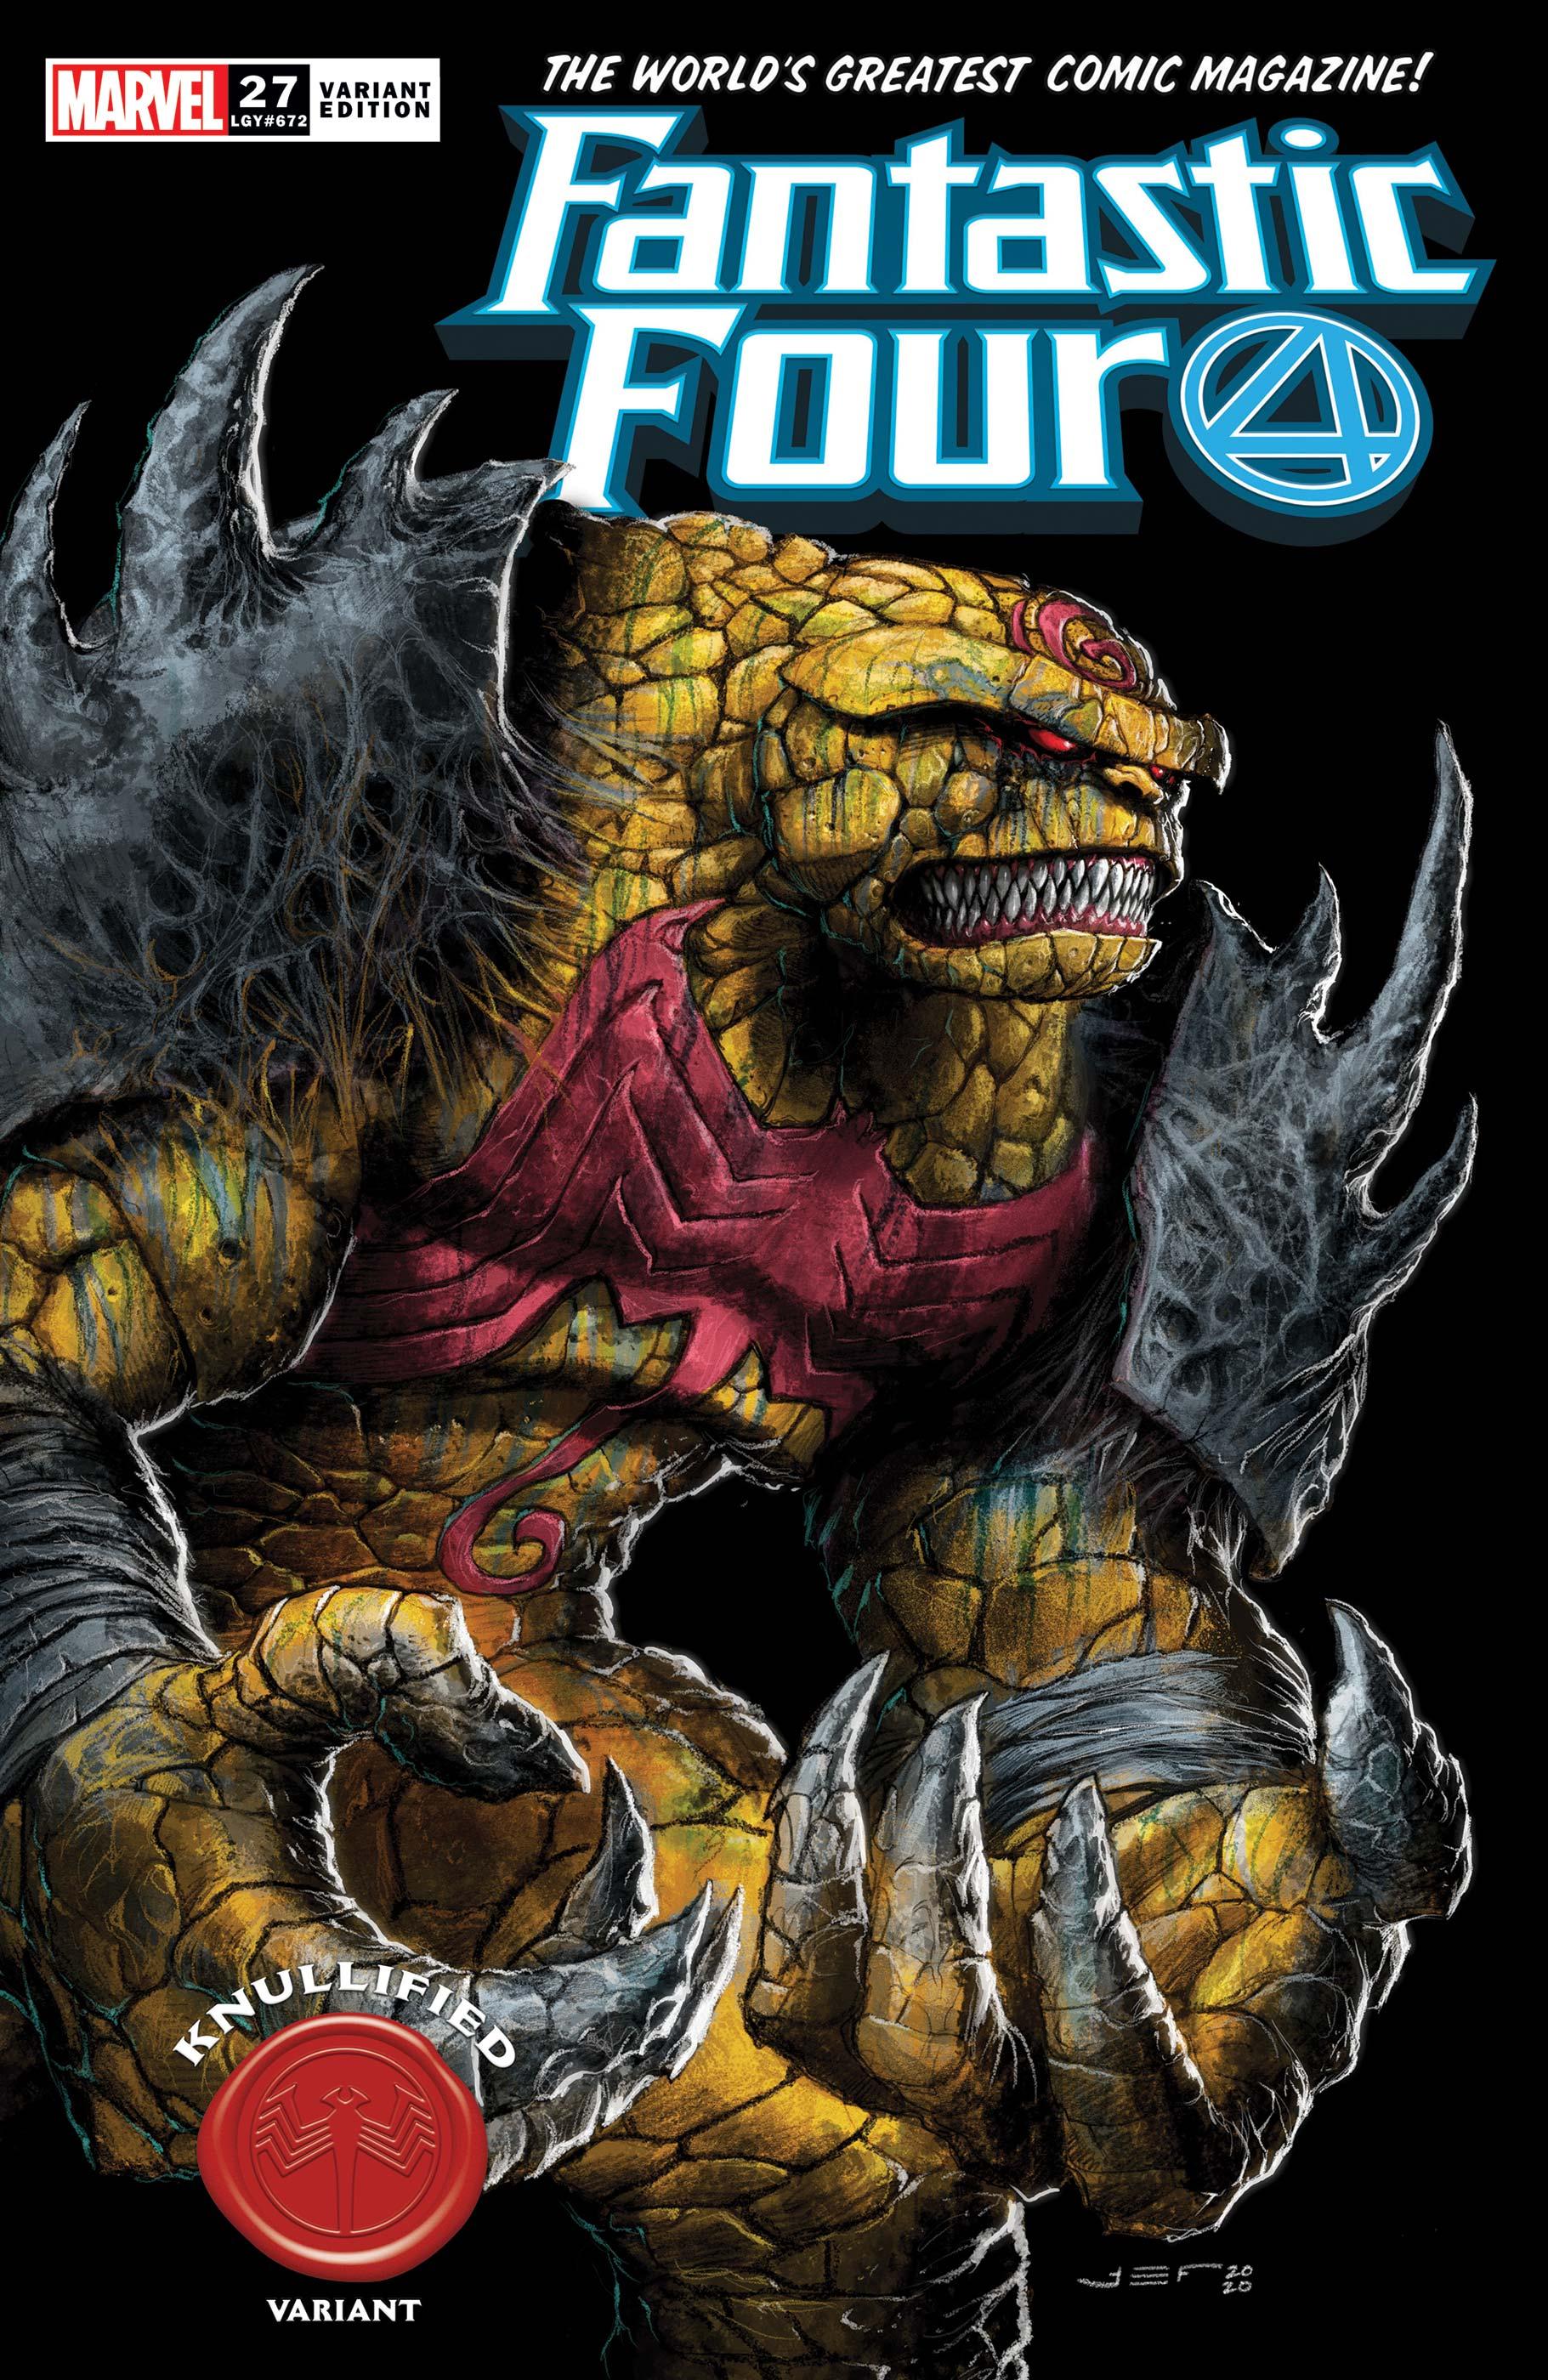 Fantastic Four (2018) #27 (Variant)